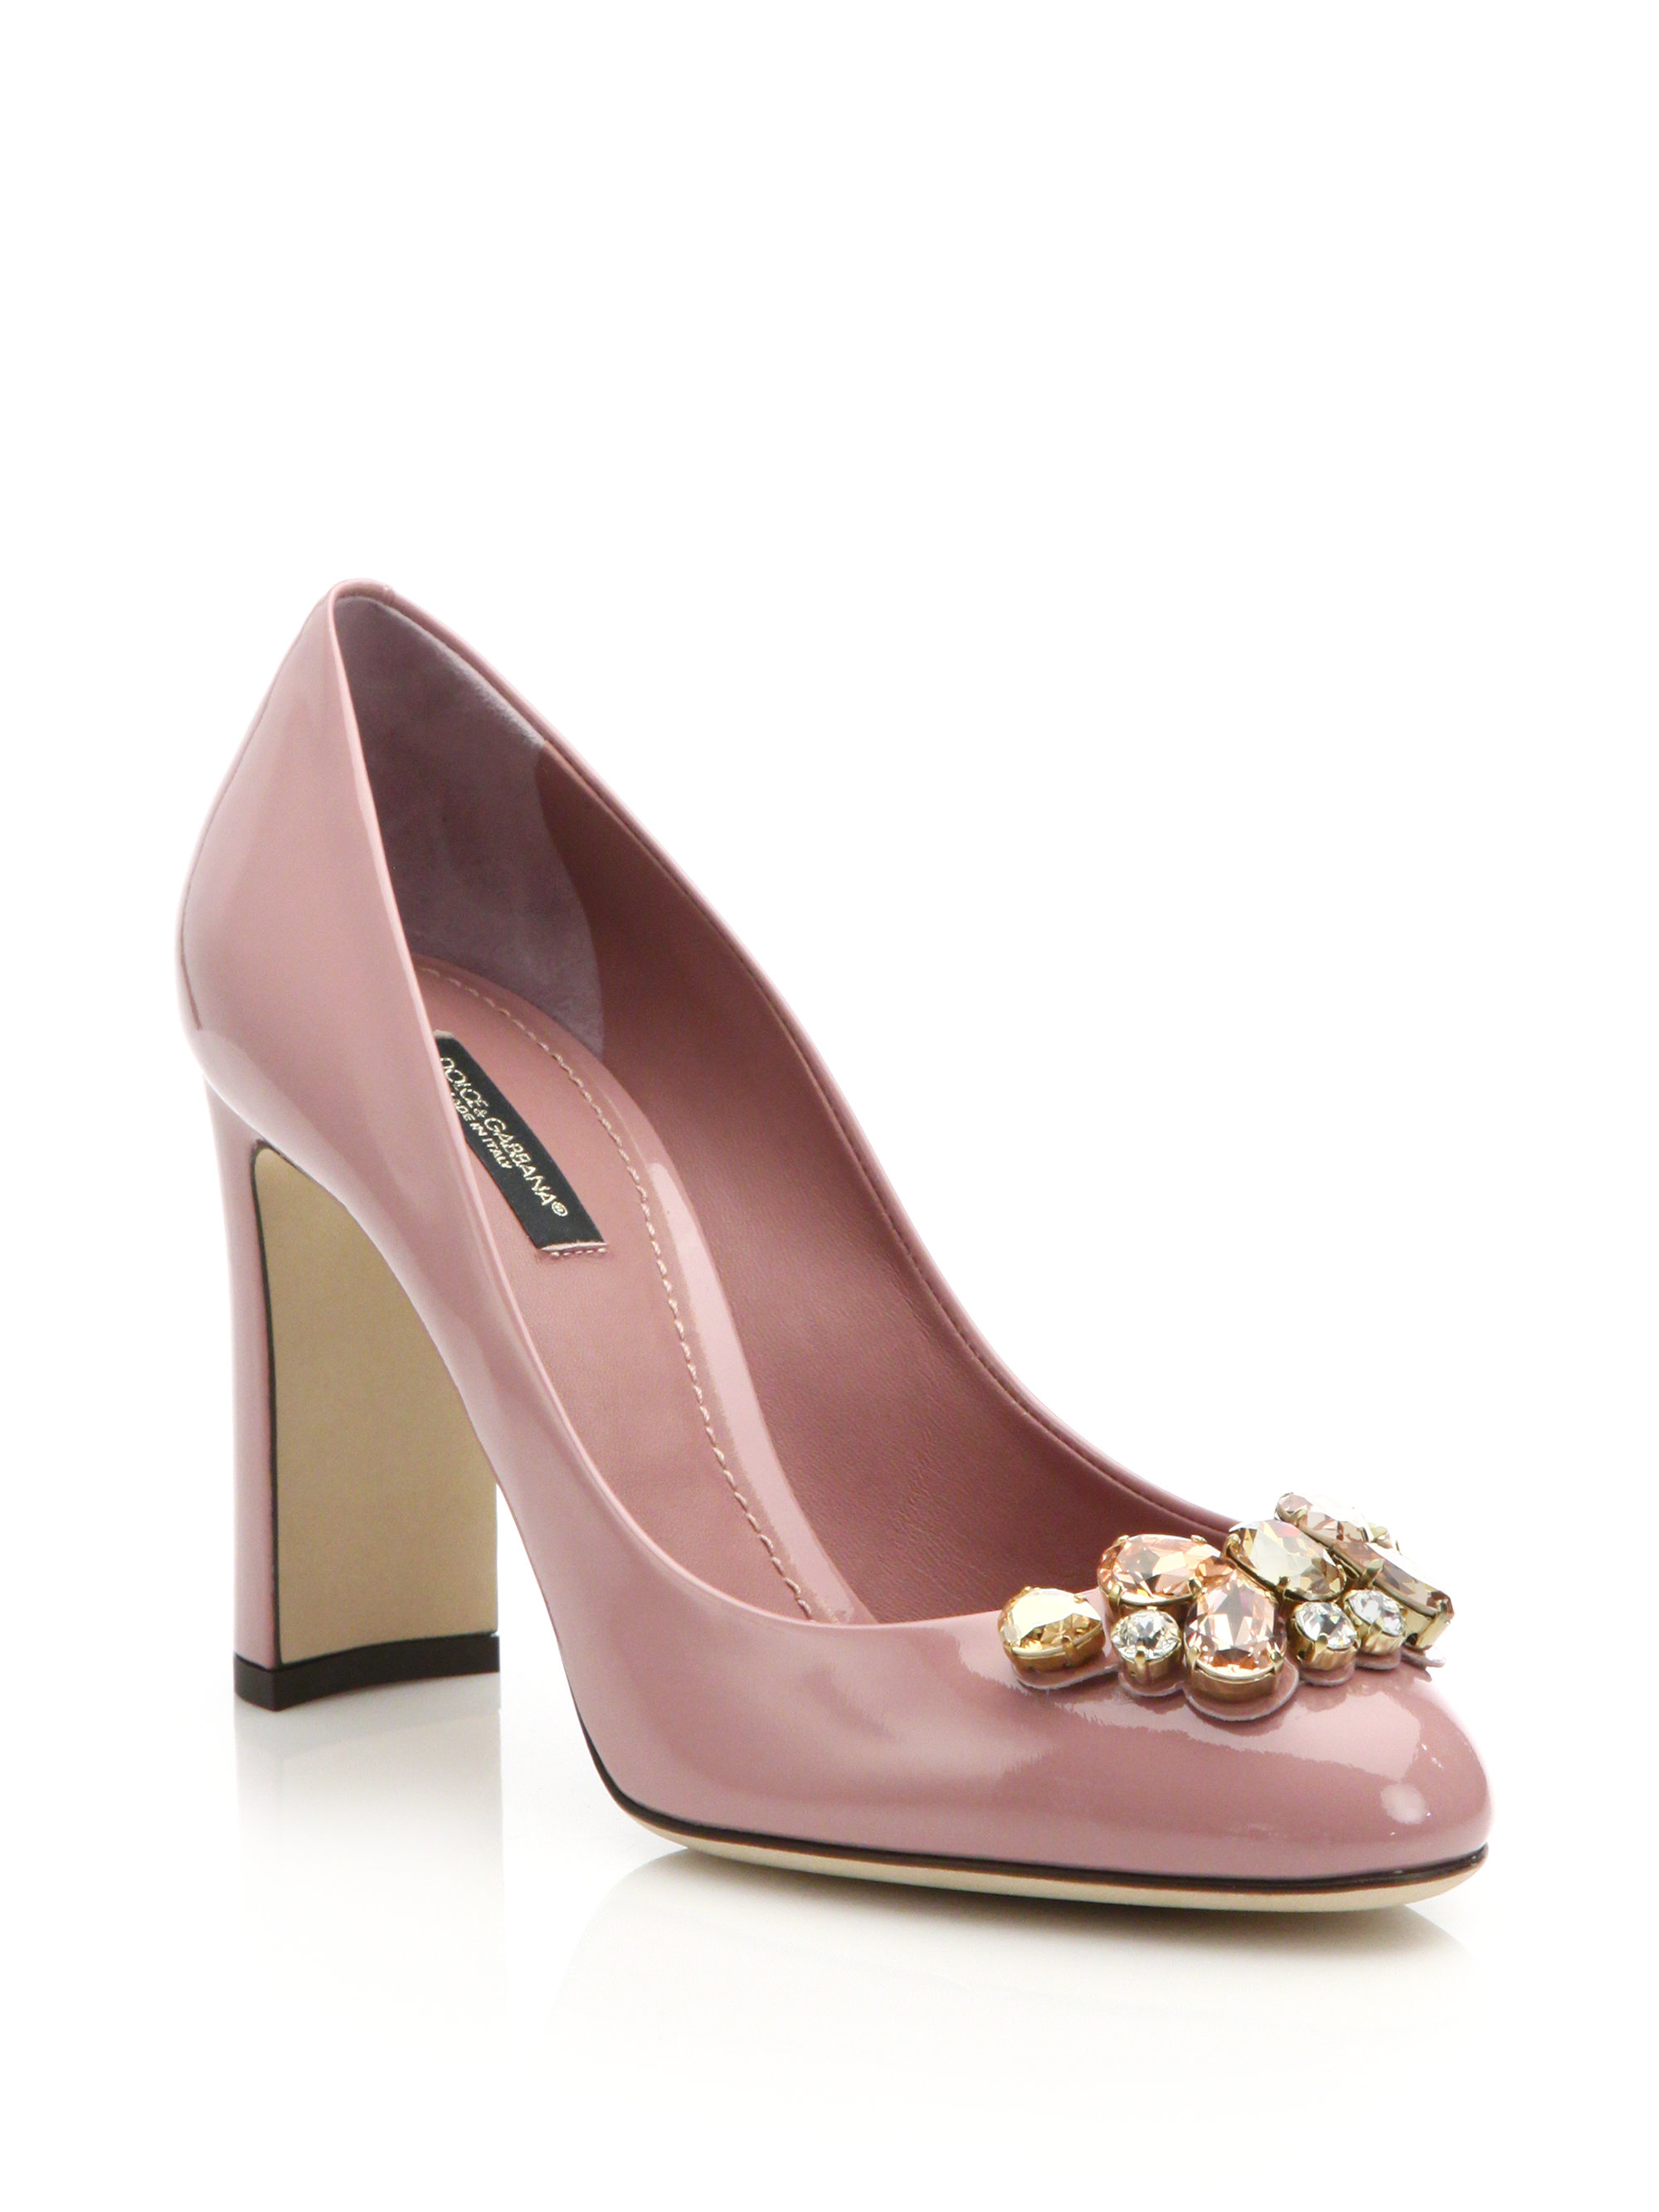 Dolce & Gabana Patent Leather Heels 7Skve